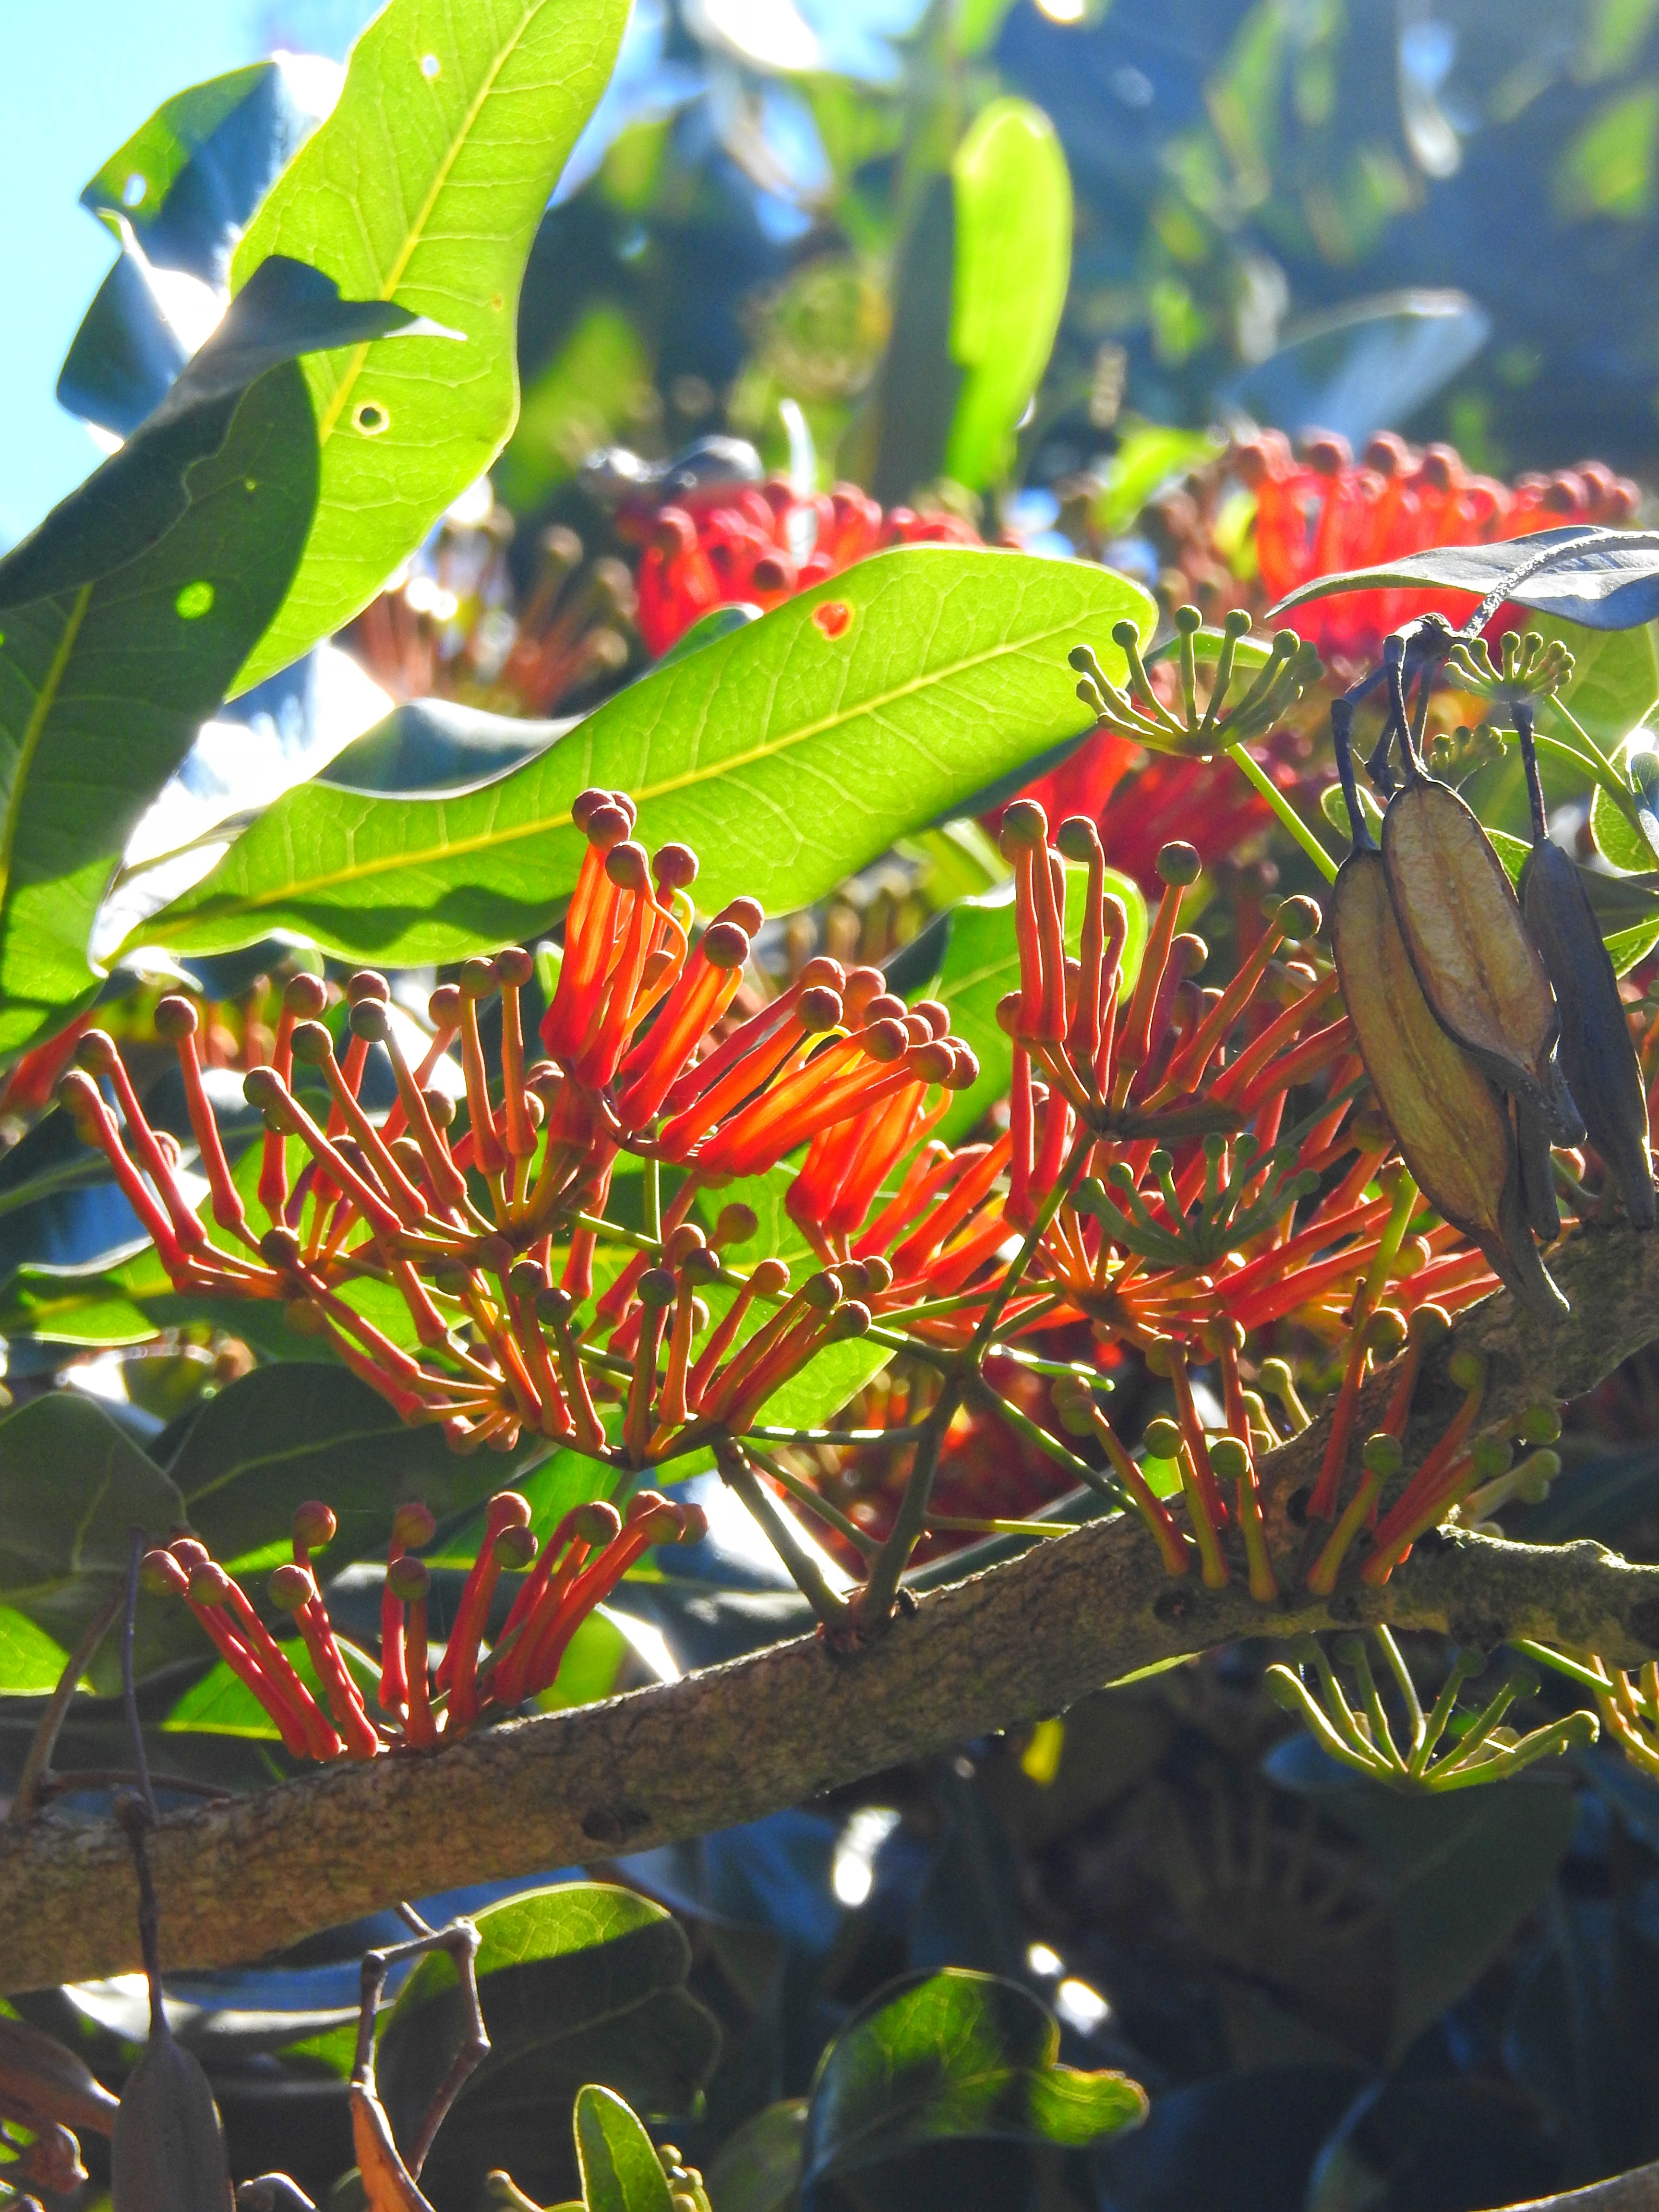 Stenocarpus Sinuatus - Firewheel Tree :: nasionatropikalne.pl